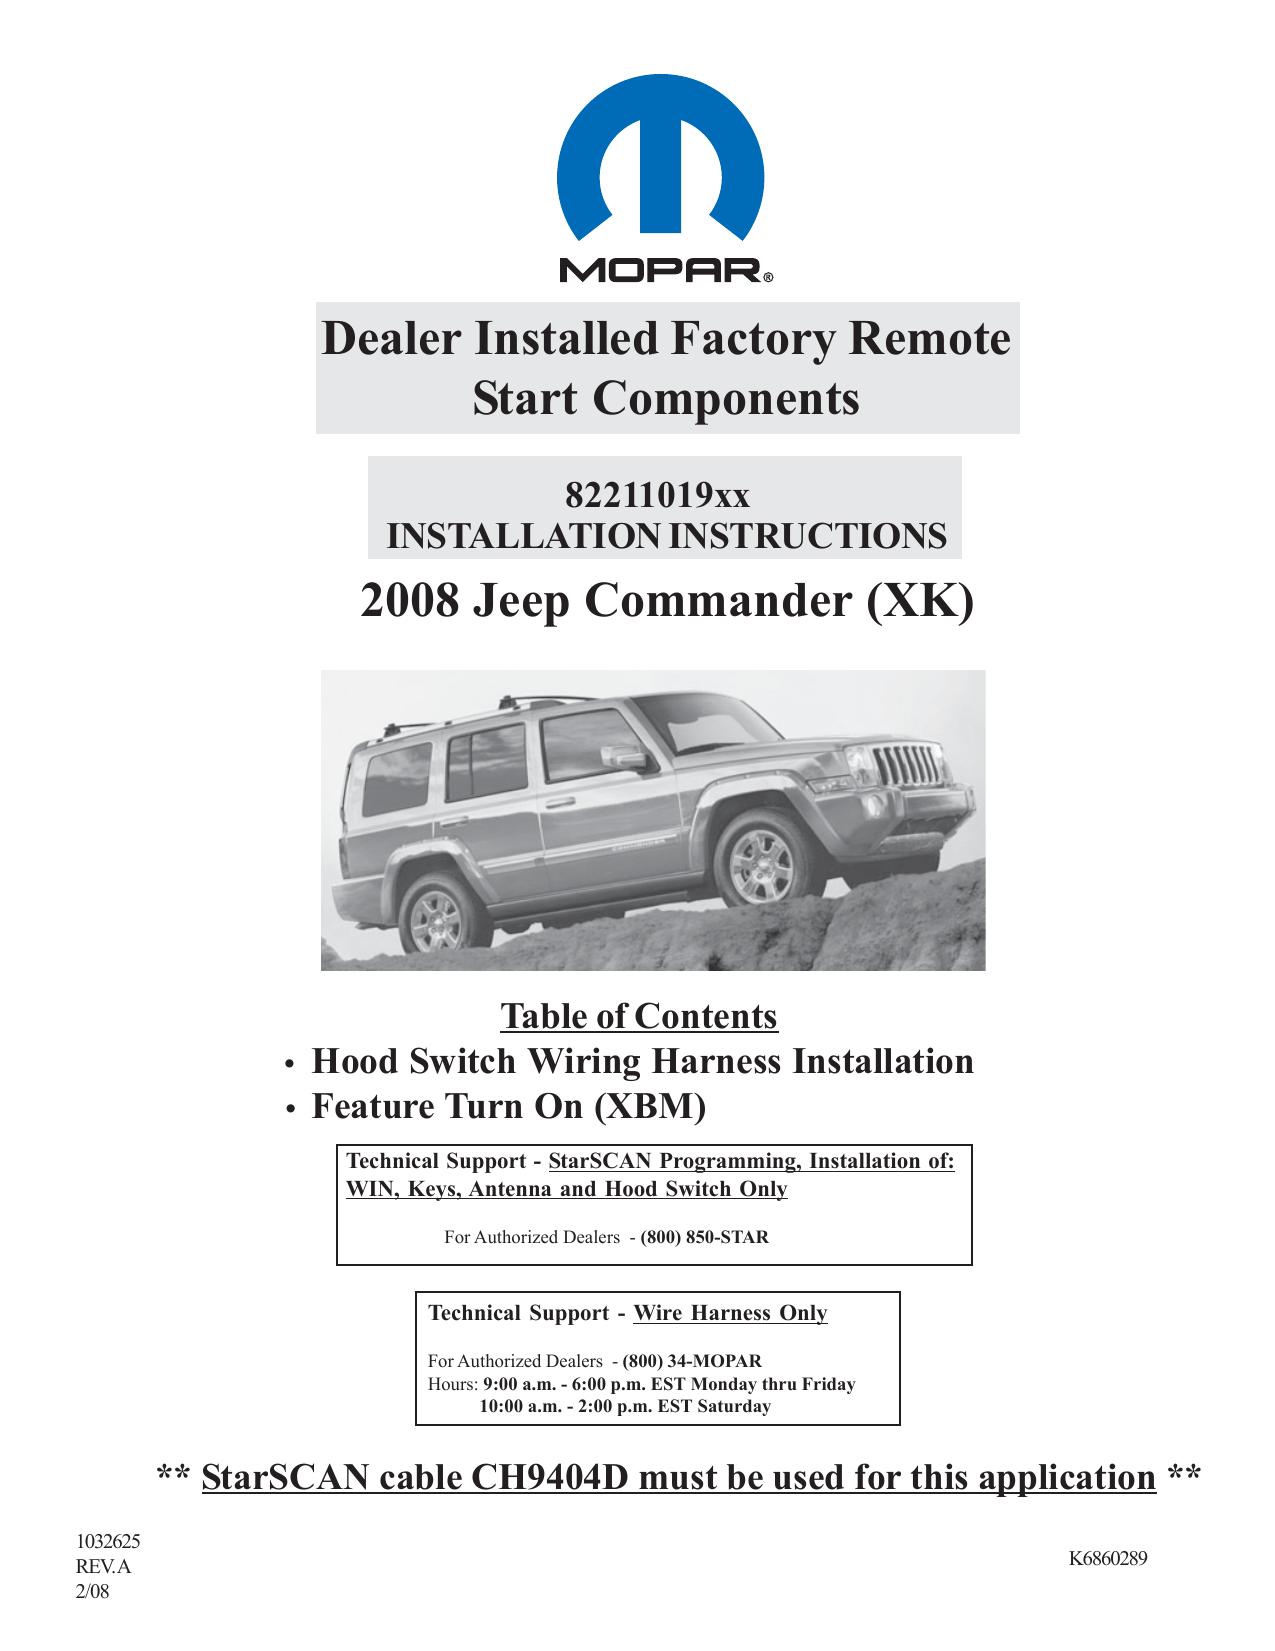 jeep commander trailer wiring jeep commander wiring harness wiring diagram data  jeep commander wiring harness wiring